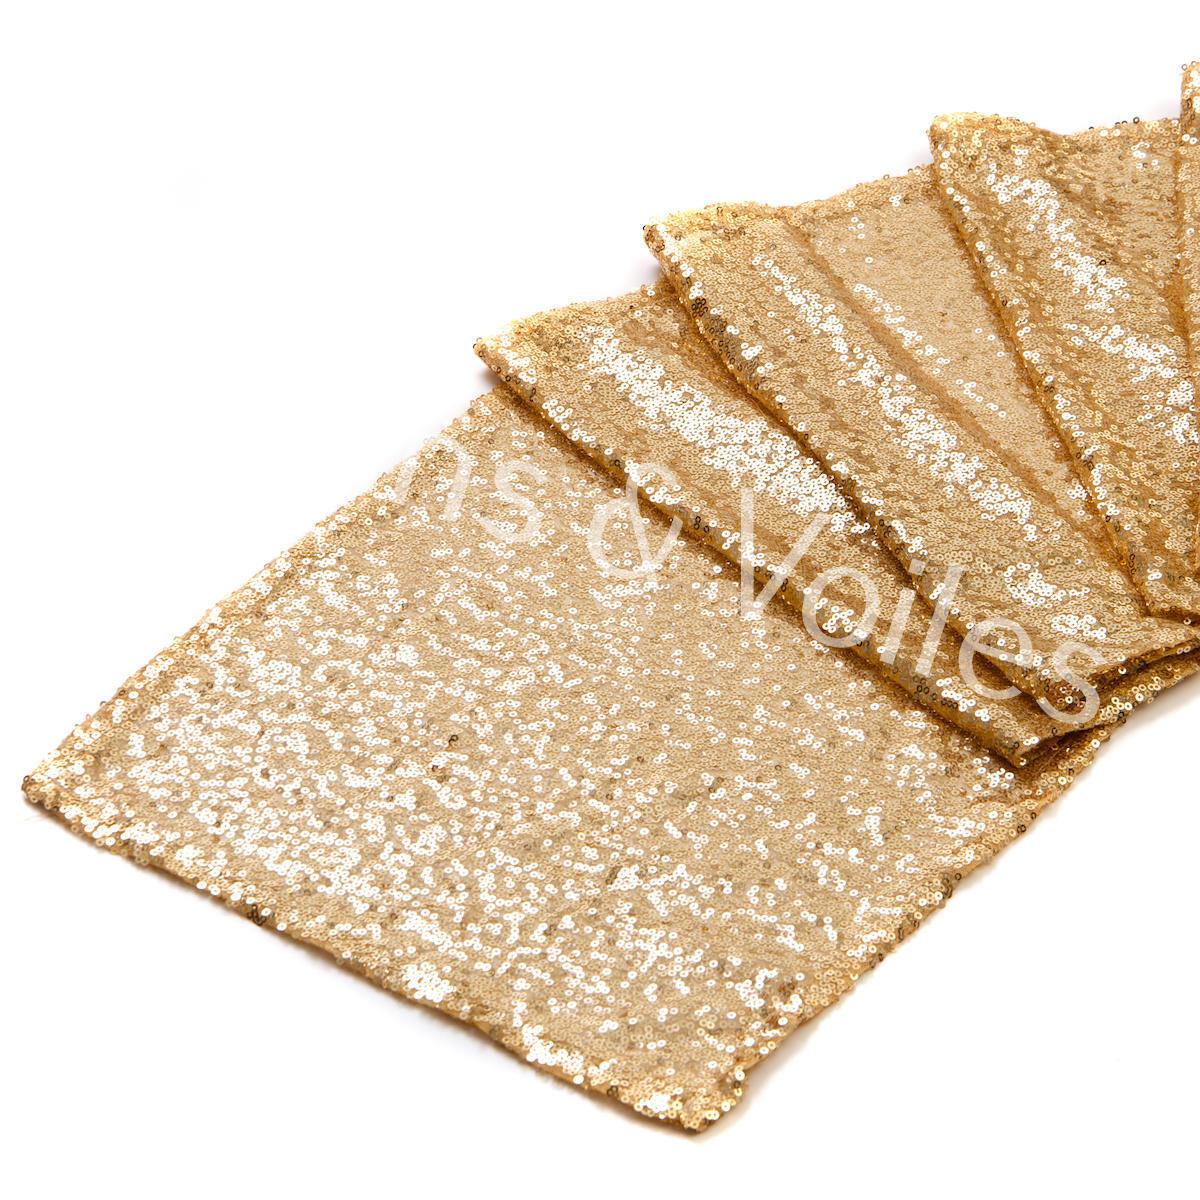 Sequin Sparkle wedding Party Table Runner Genuine UK SELLER 12  x 108  SOFT Gold